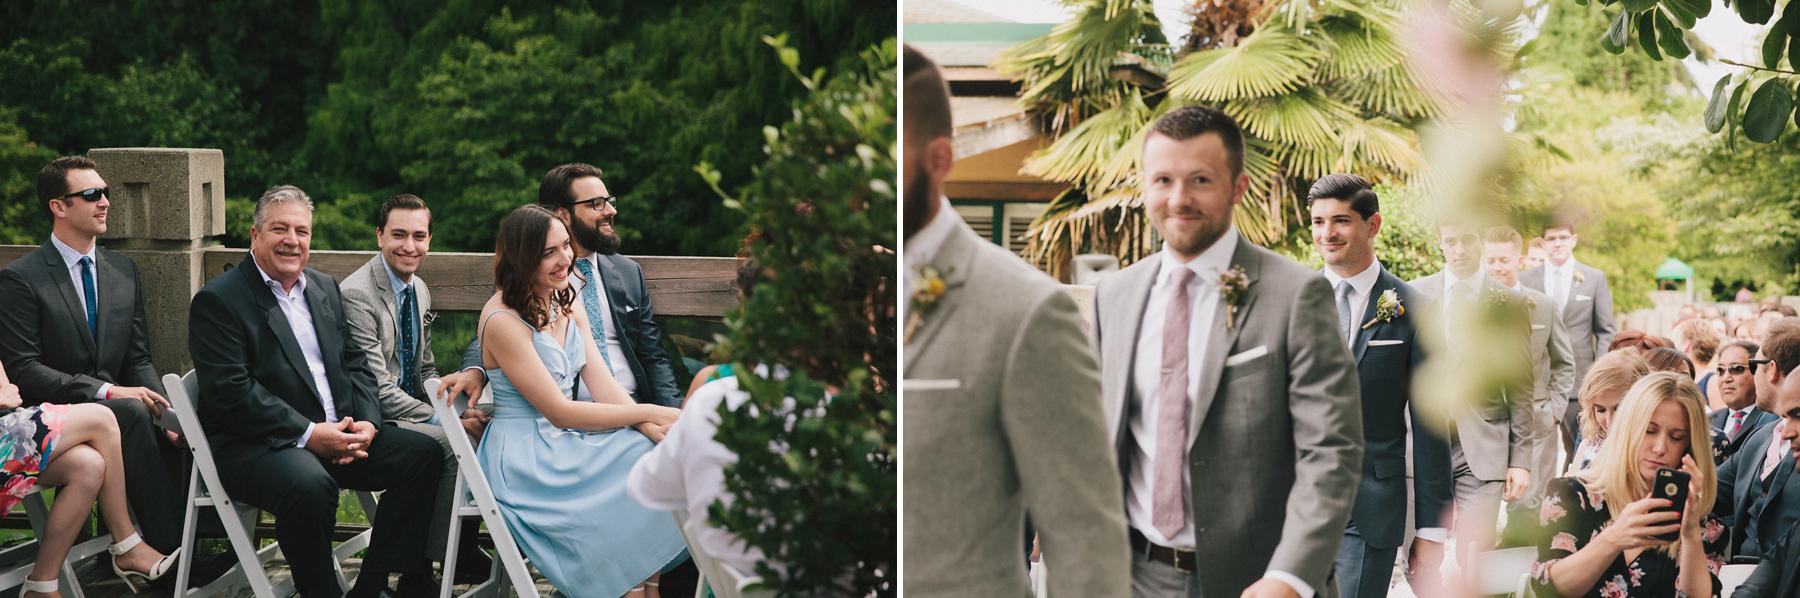 UBC-Botanical-Garden-Wedding-AD-030.jpg